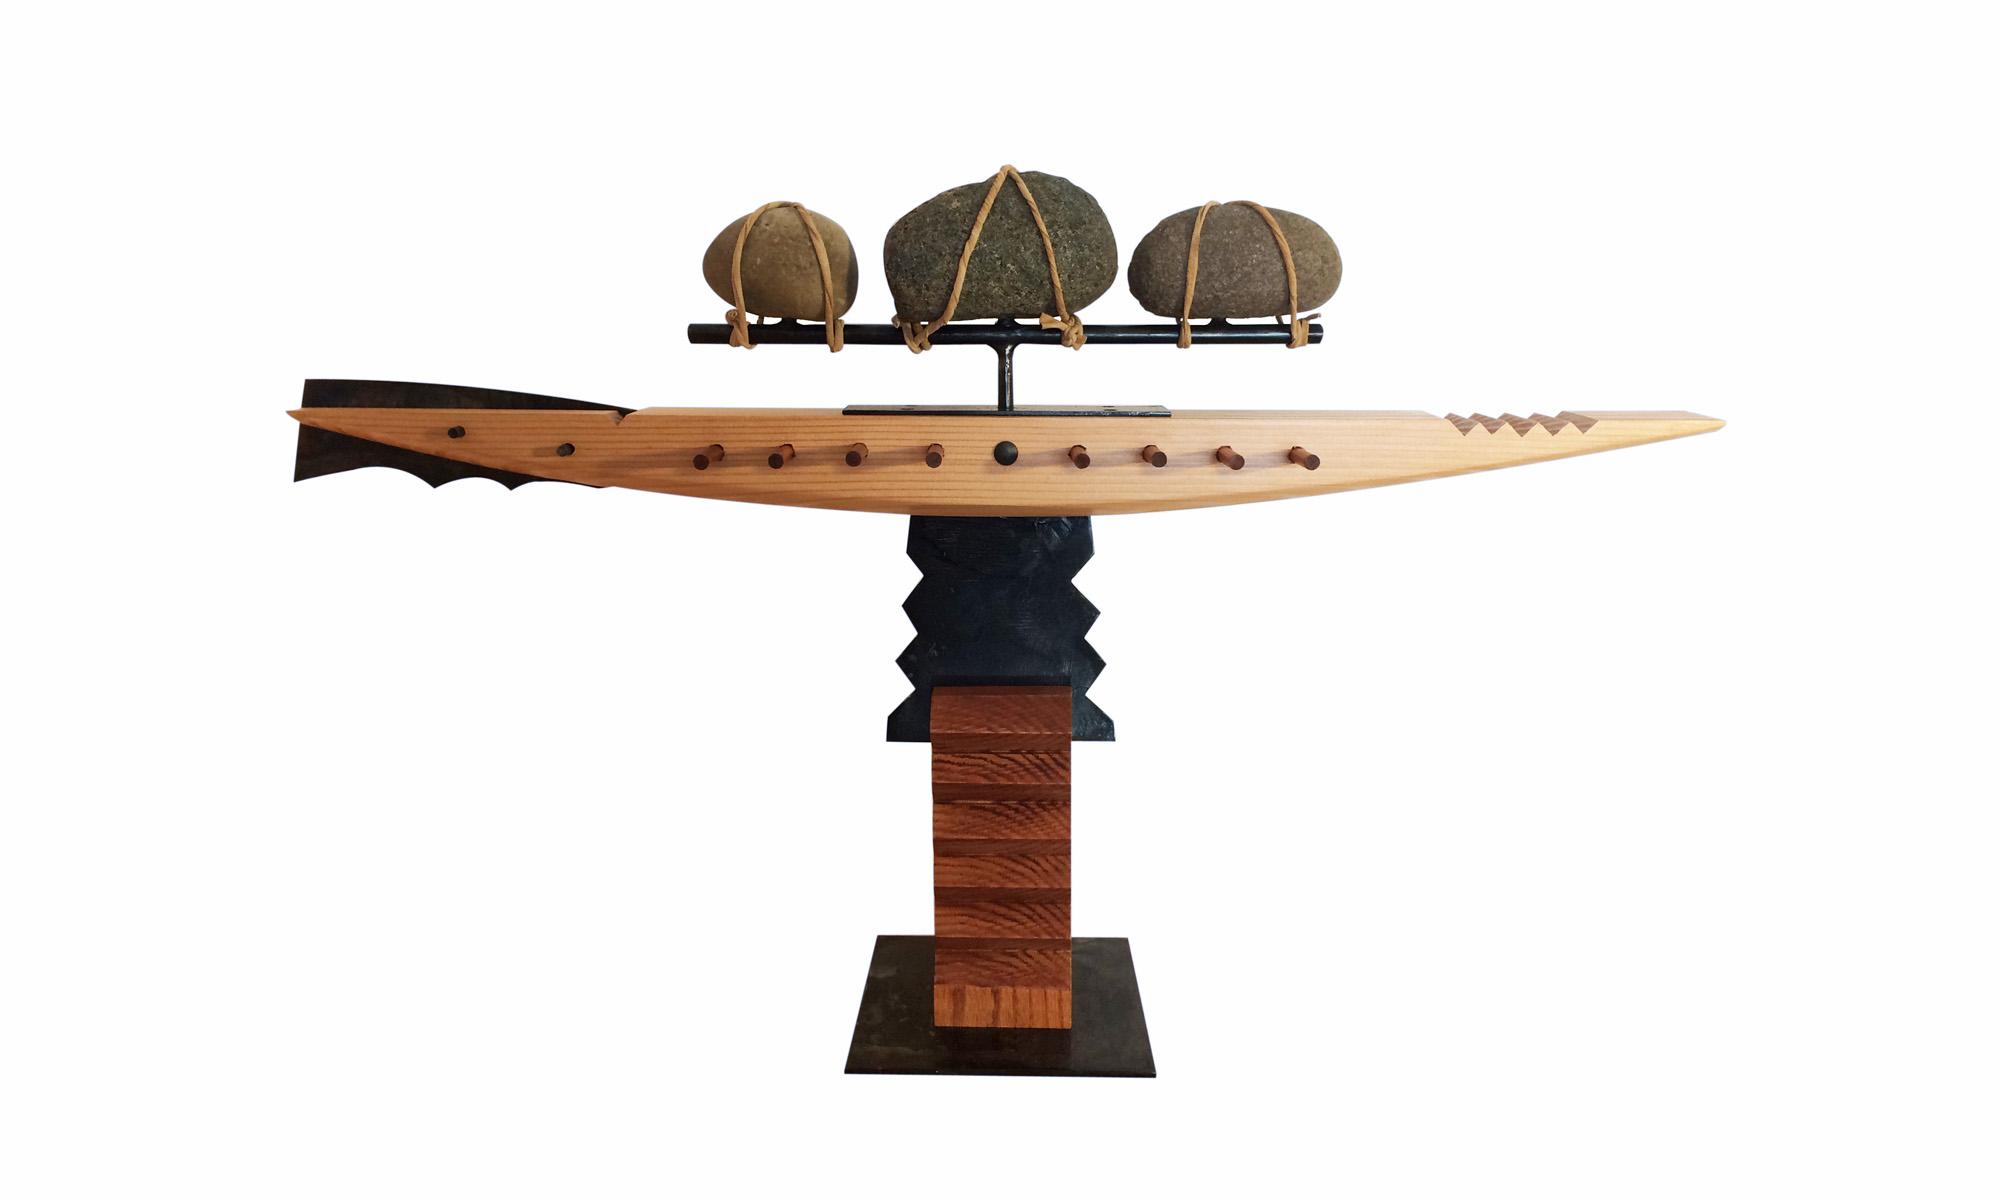 John Nihart Sculpture